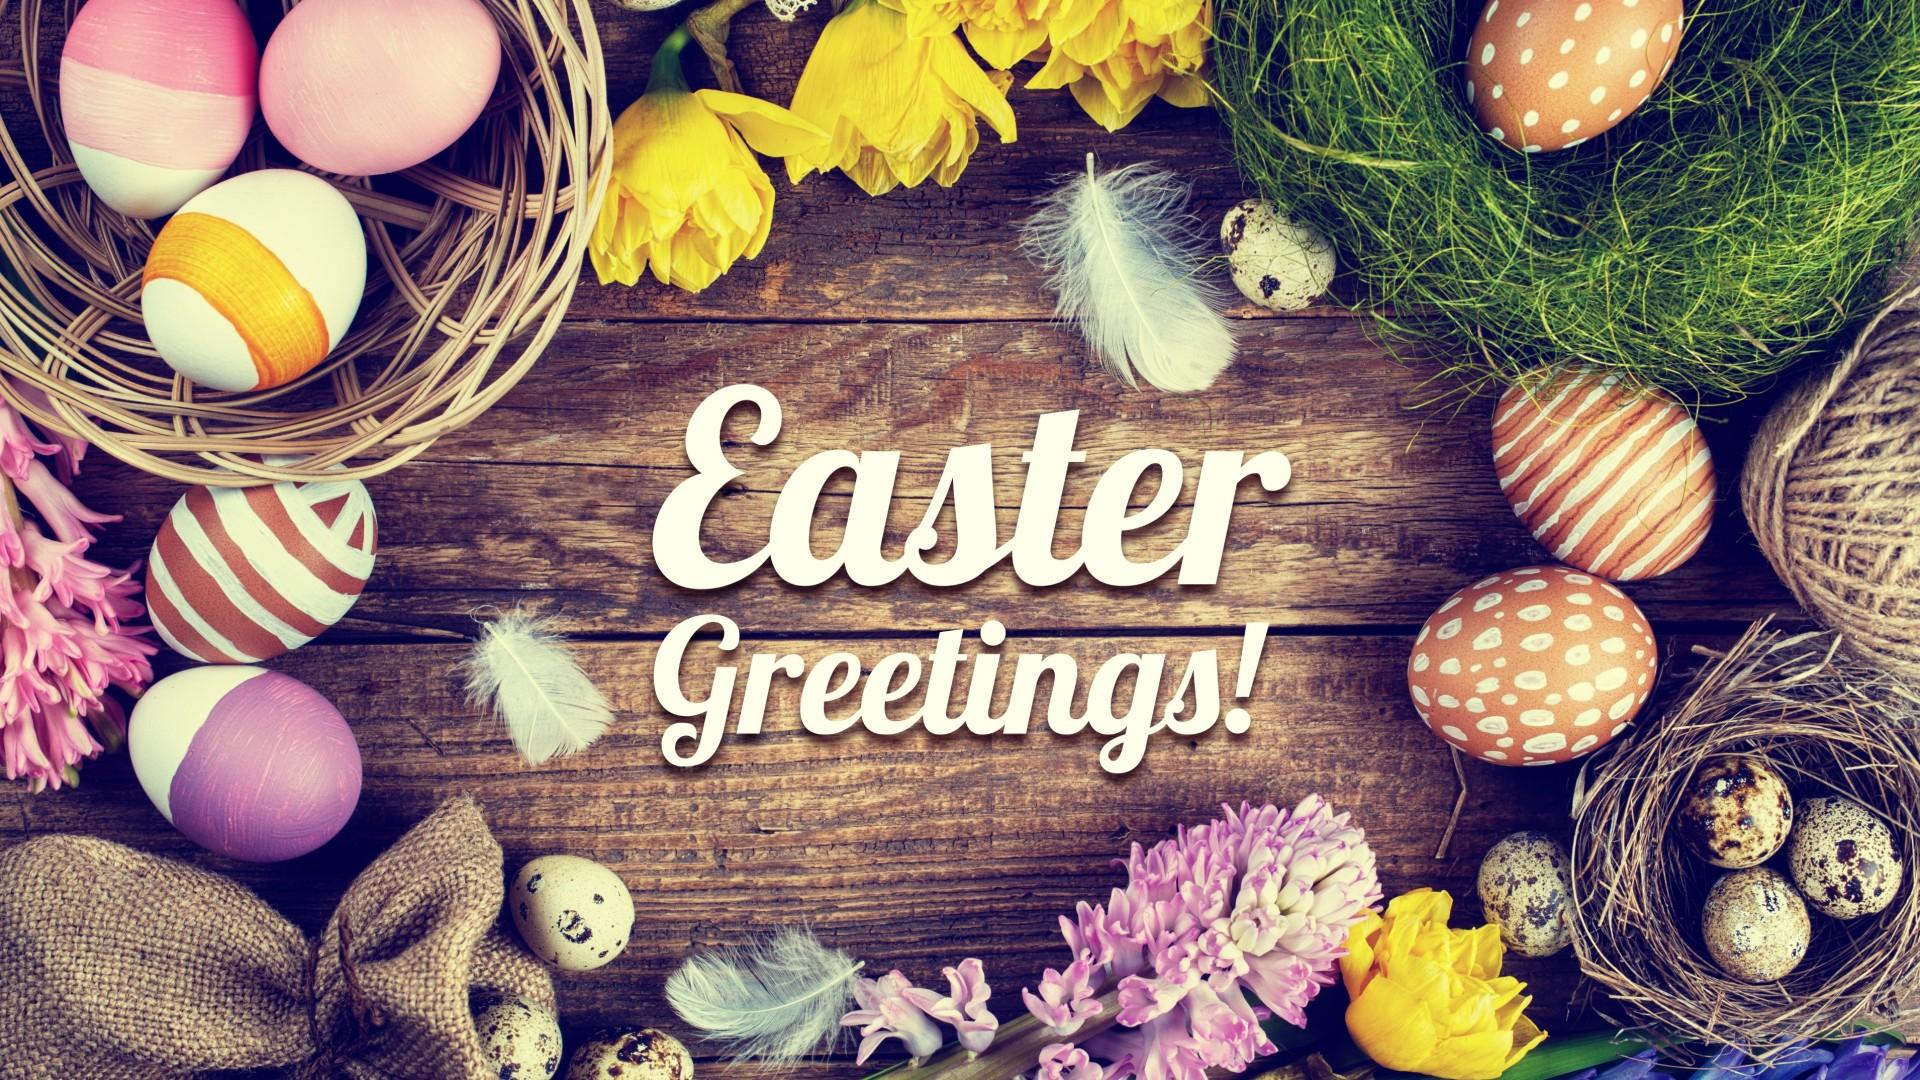 Easter Greetings Ultra HD wallpaper UHD WallpapersNet 1920x1080